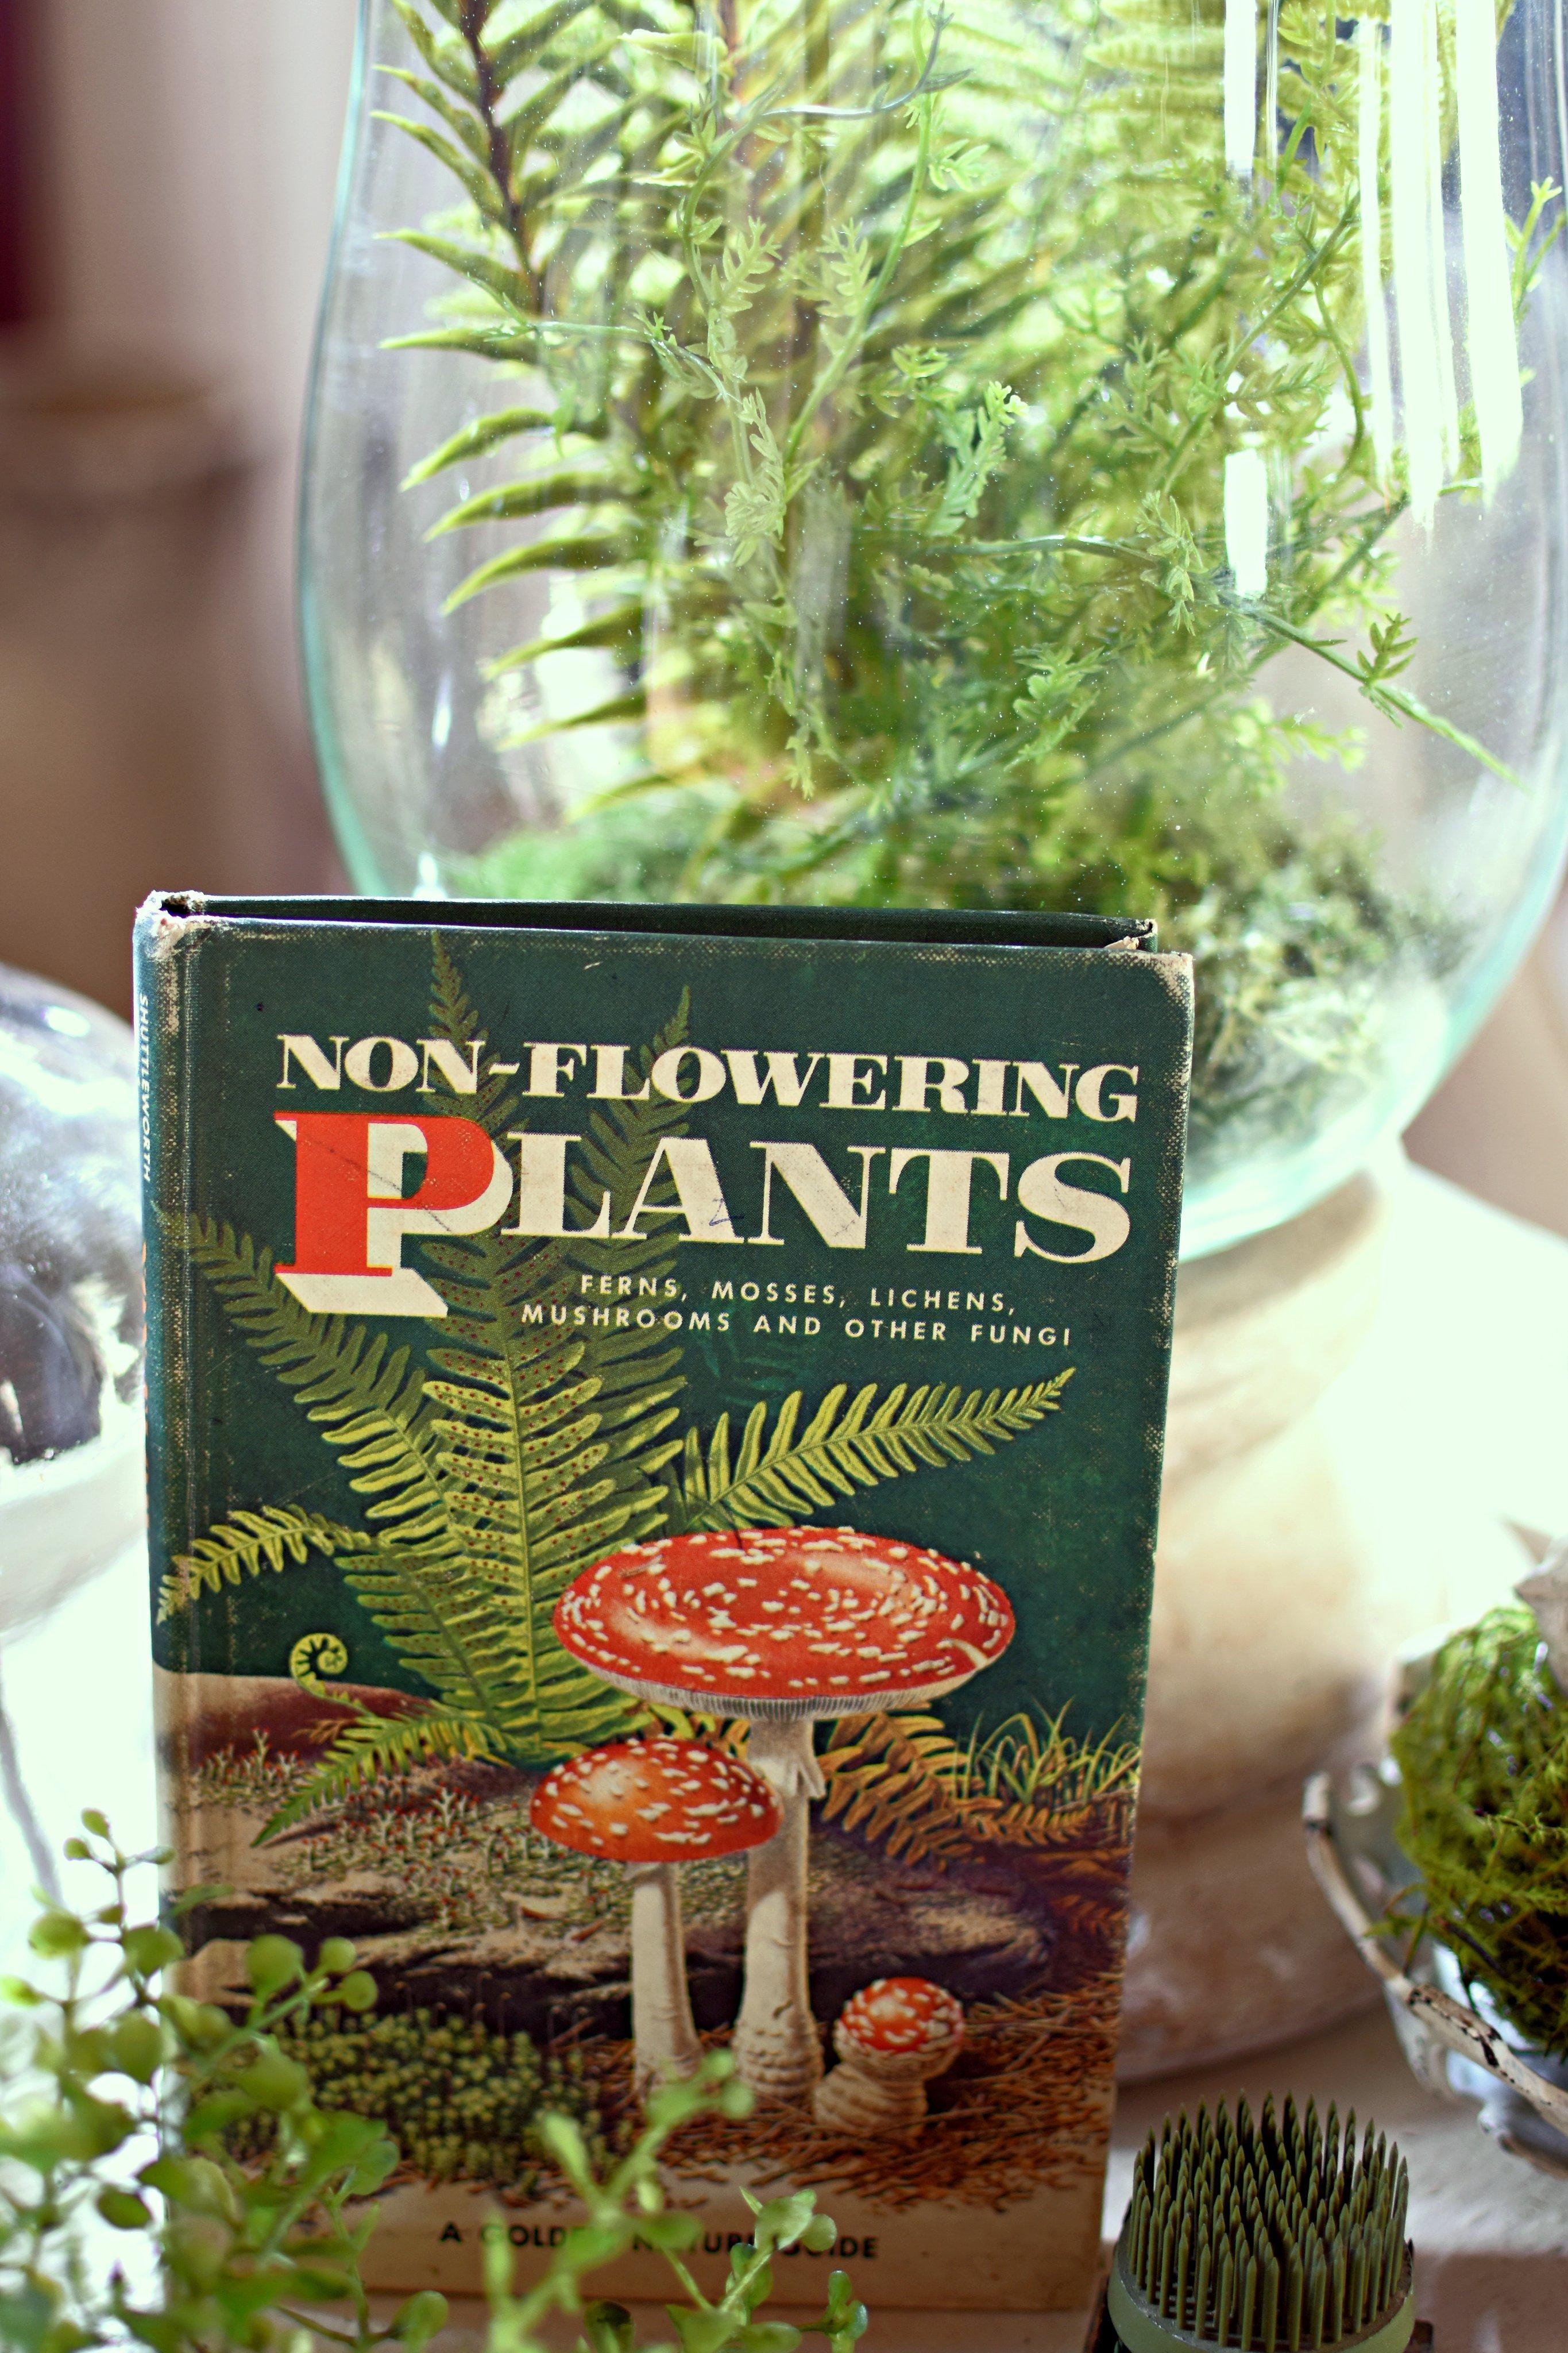 Vintage Botanical Book Non-Flowering Plants ferns, bracken, mushrooms, fungi, moss decor